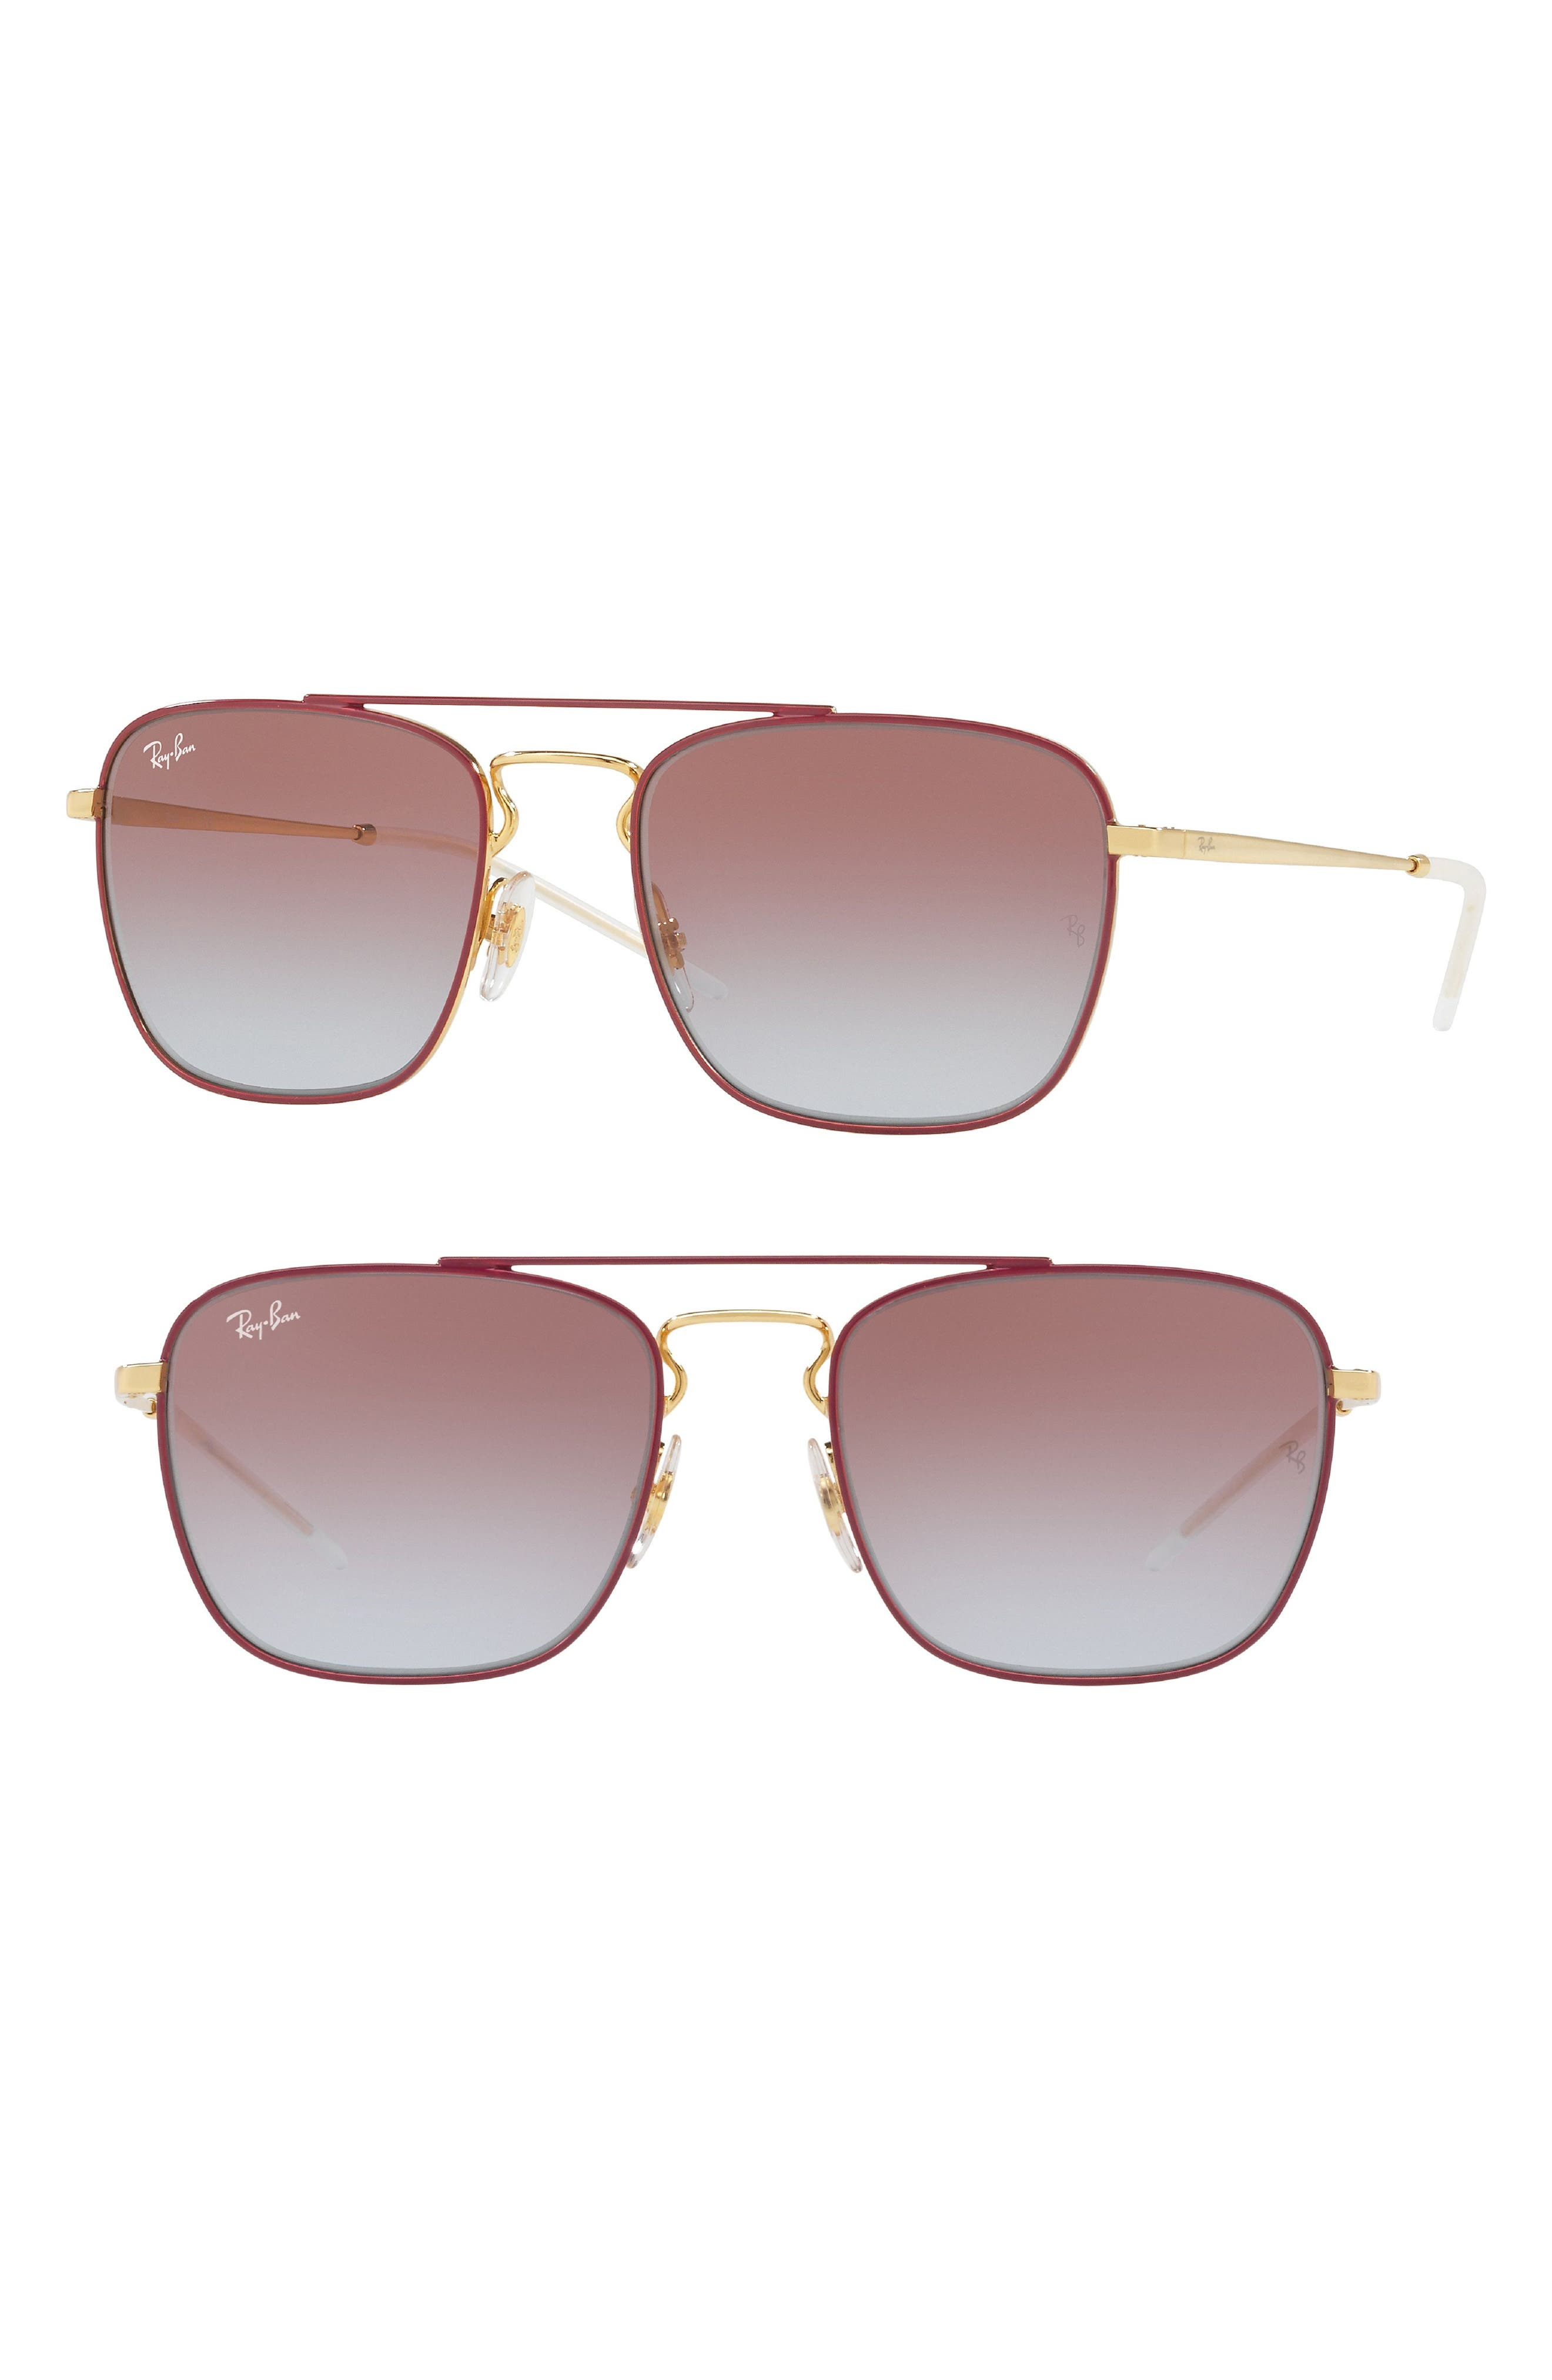 aviator sunglasses Bordeaux